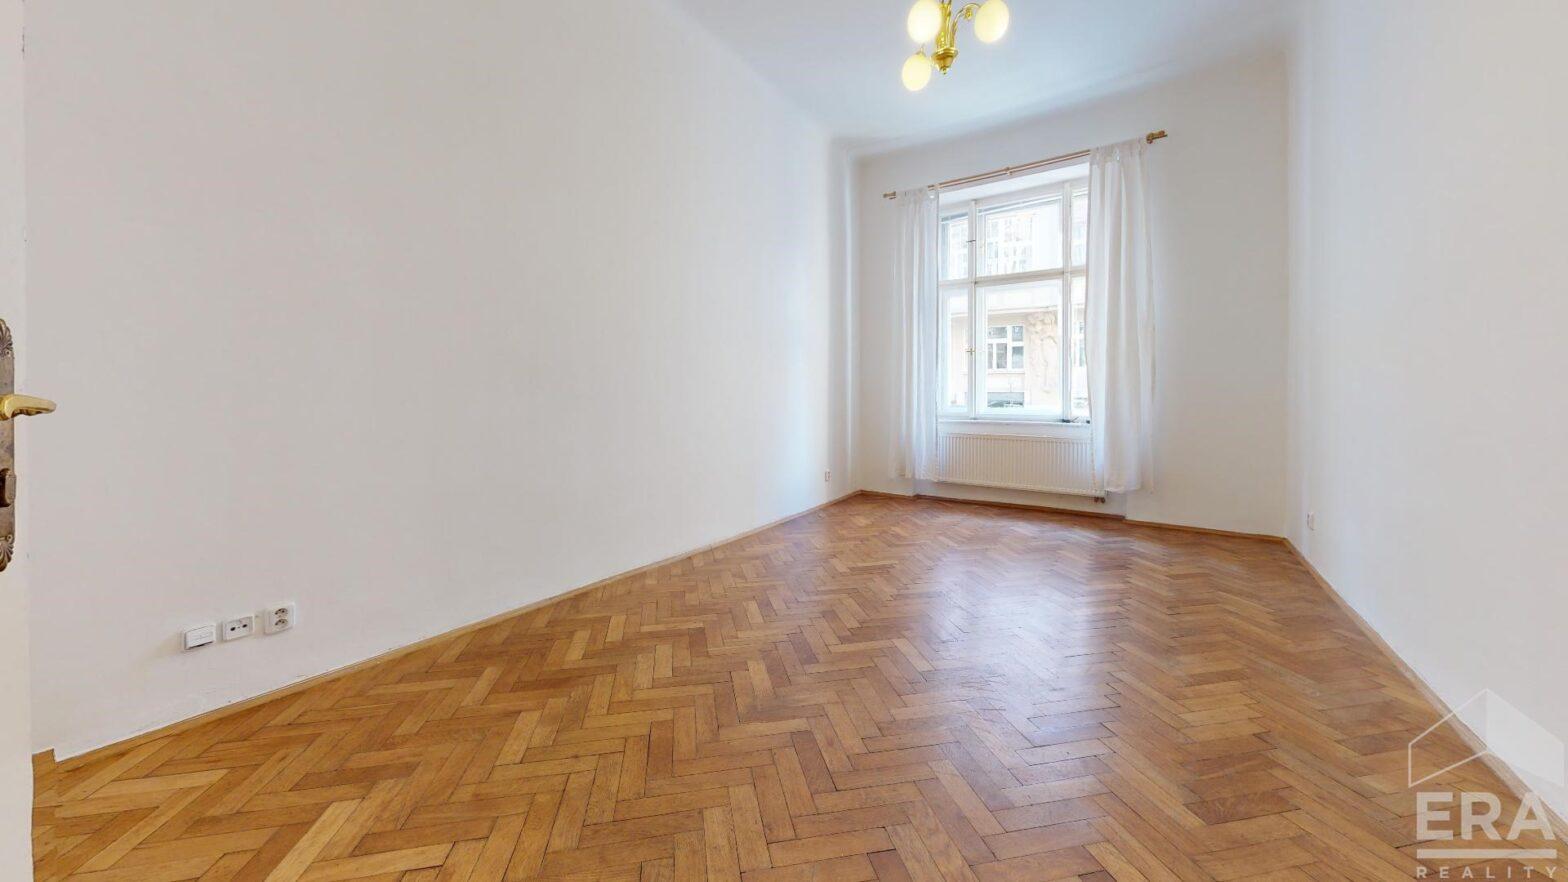 Pronájem bytu 3+kk, 95 m2, ul. Vinohradská 32, Praha 2